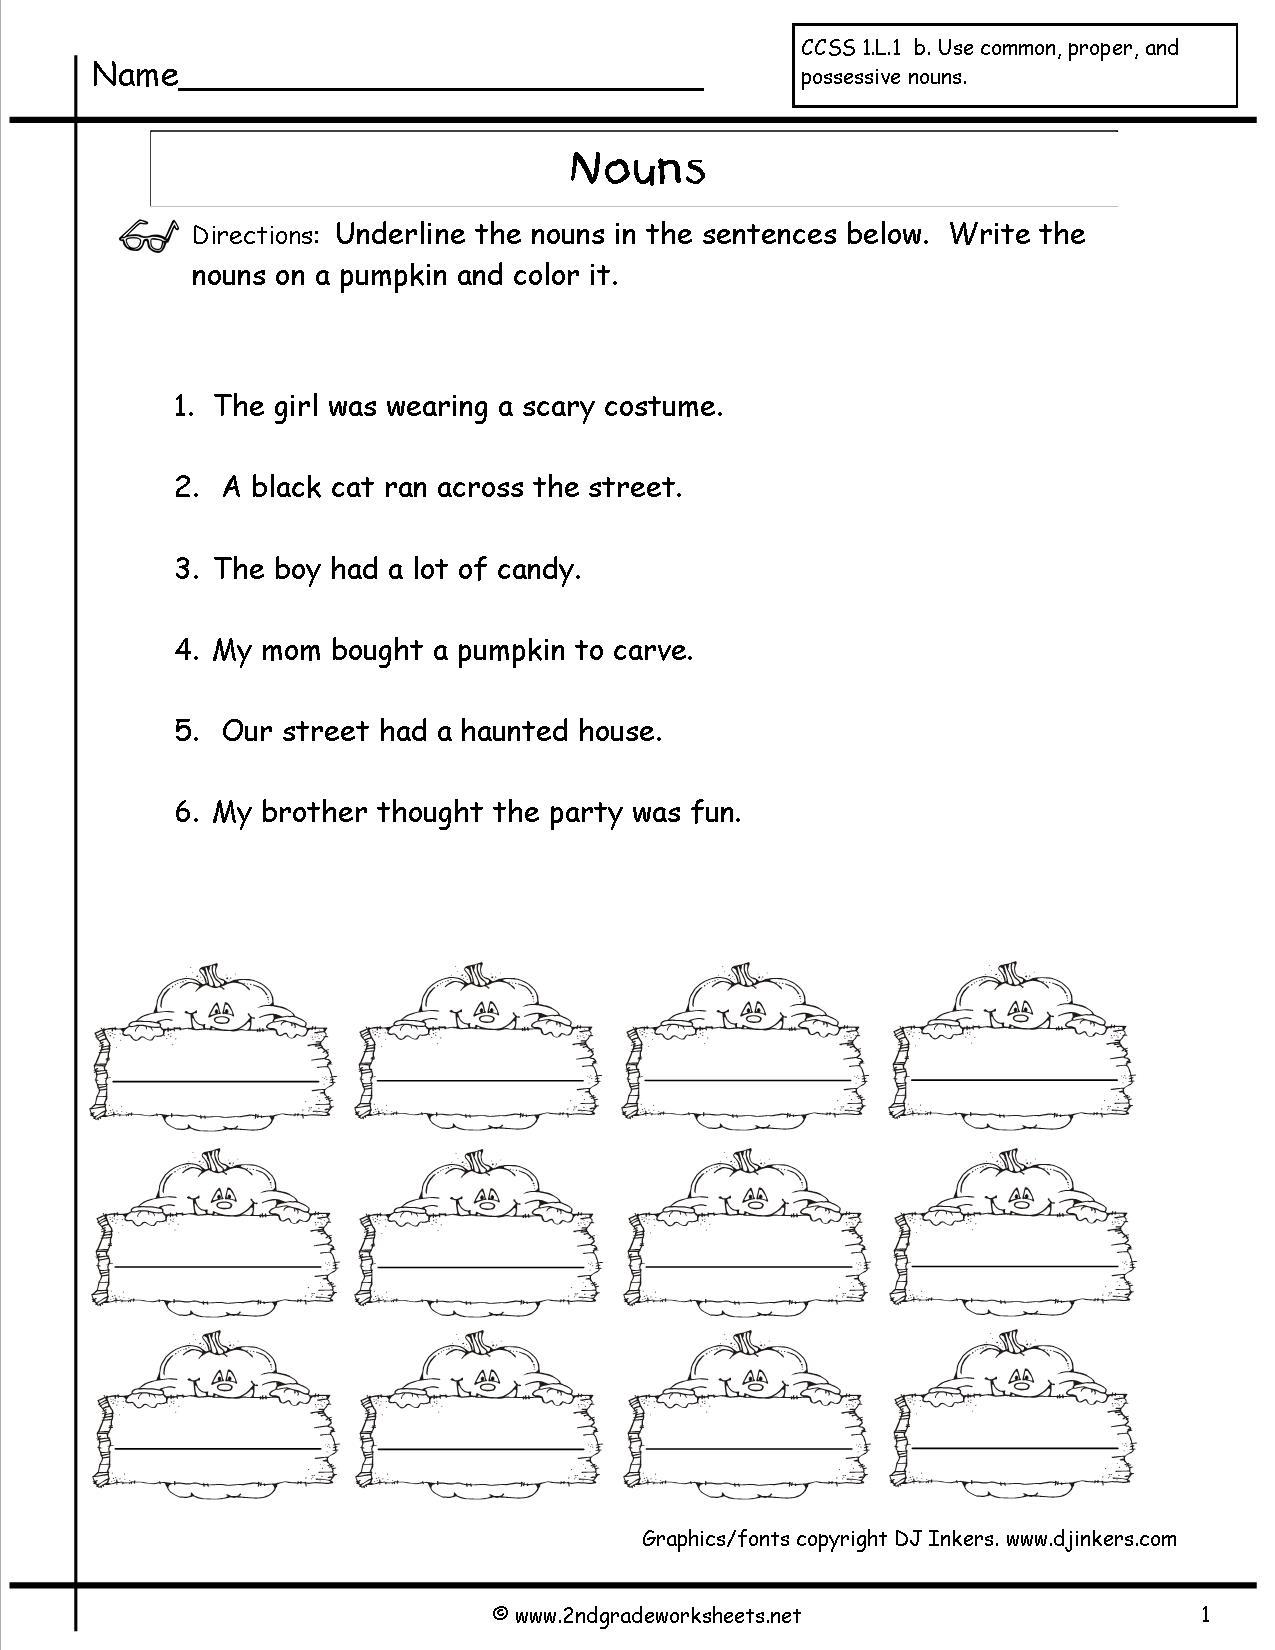 Nouns And Verbs Sorting Tons Of Fun Printables